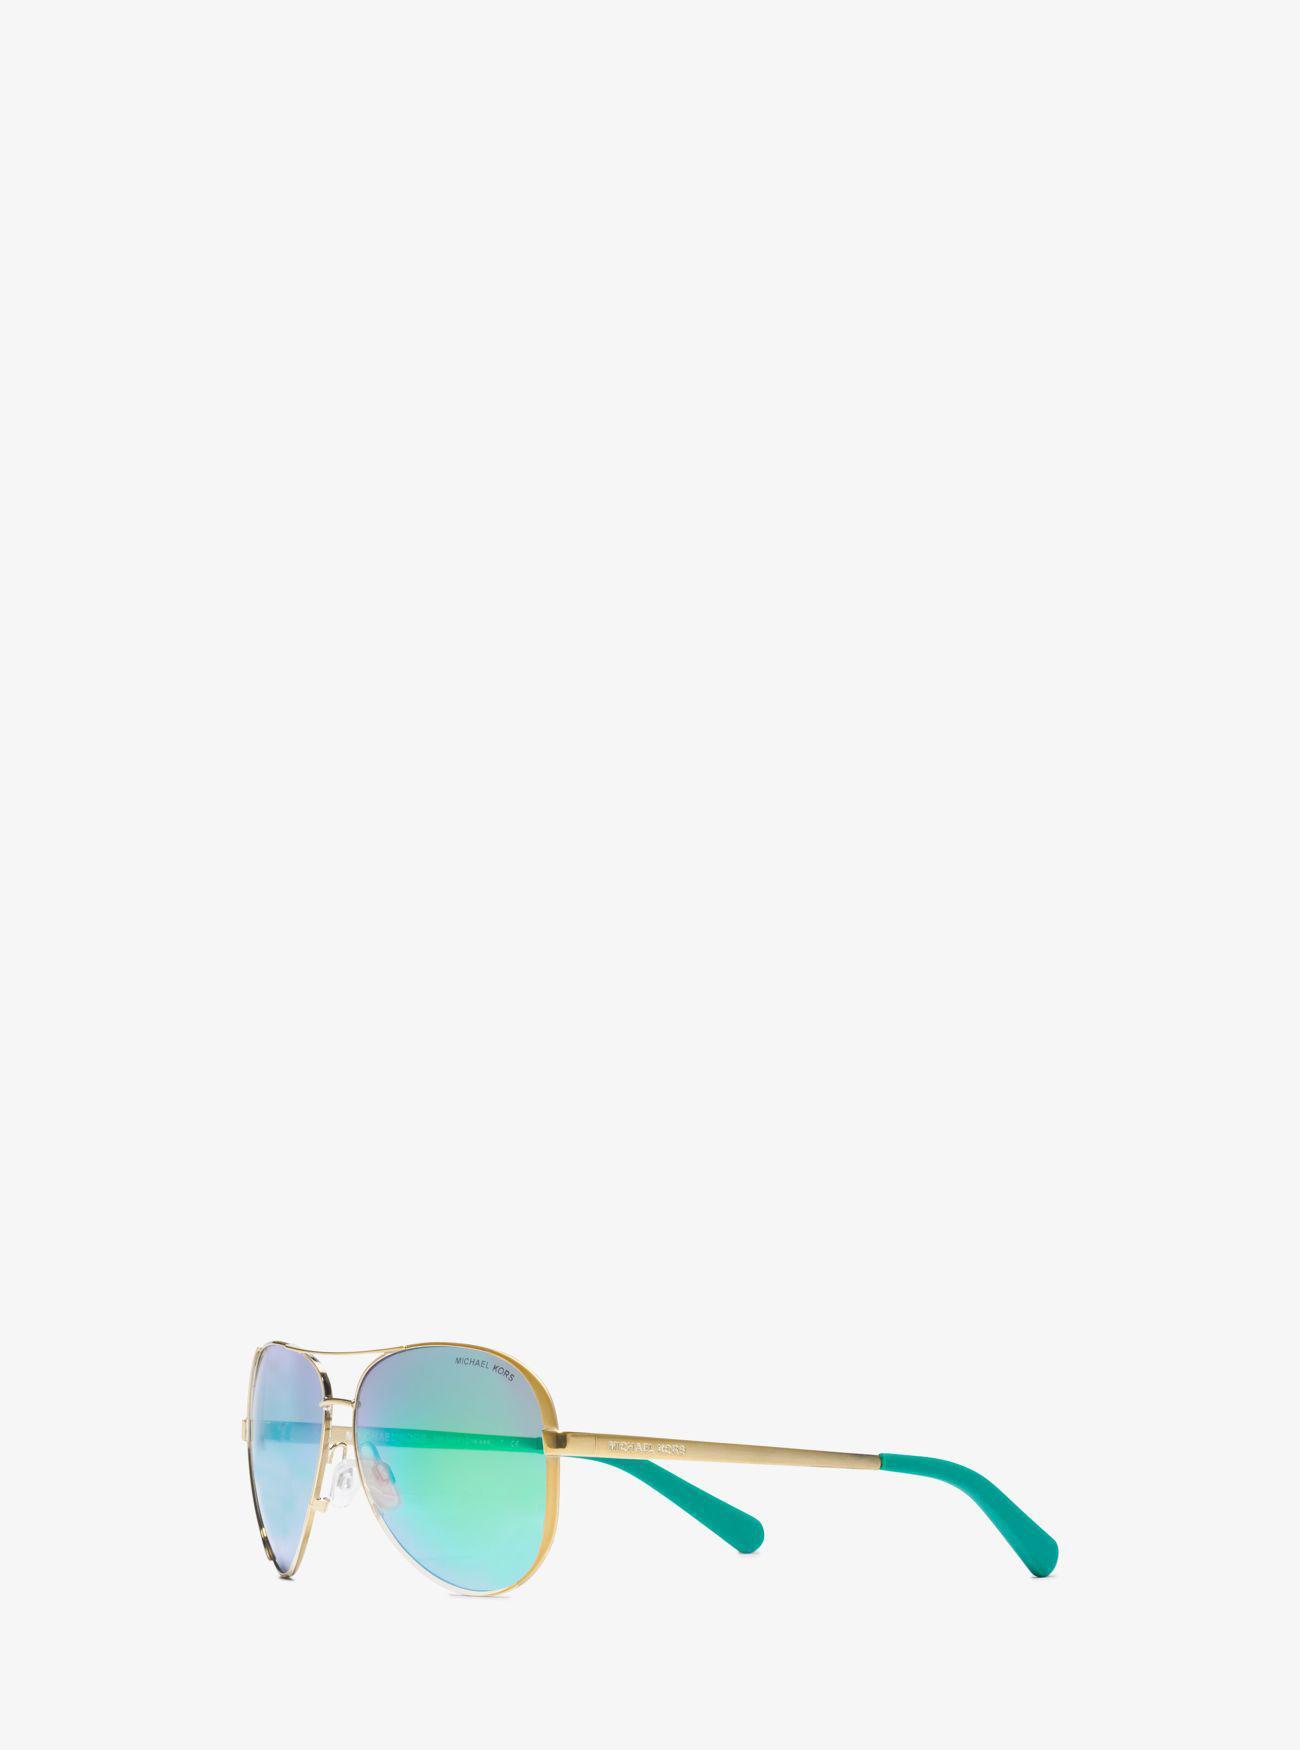 ec2a72390d10 spain tote michael kors metallic chelsea sunglasses lyst. 49802 45b11